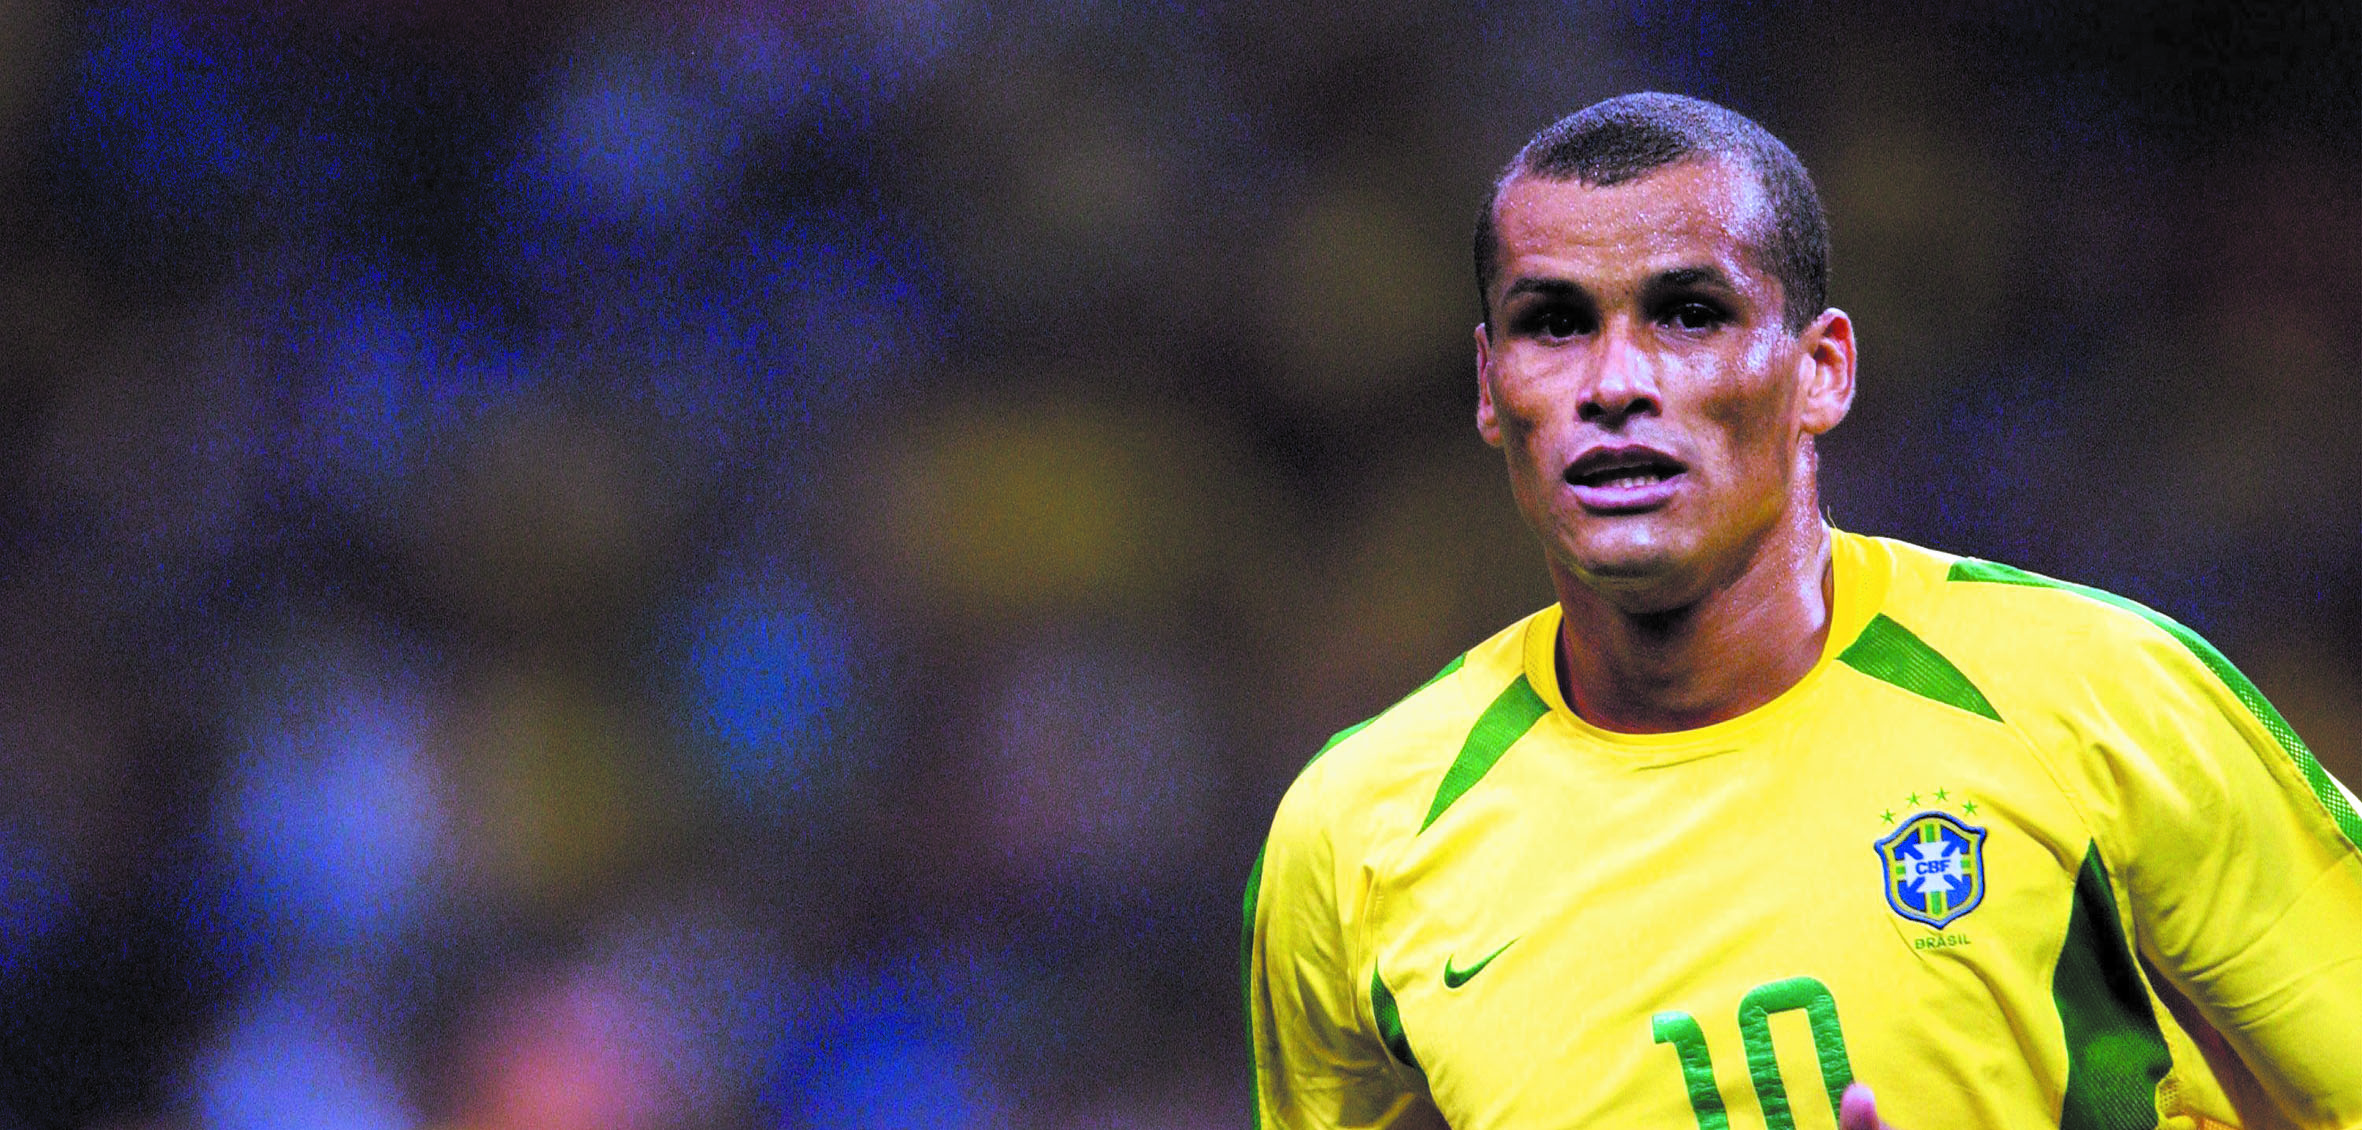 Rivaldo défend Neymar